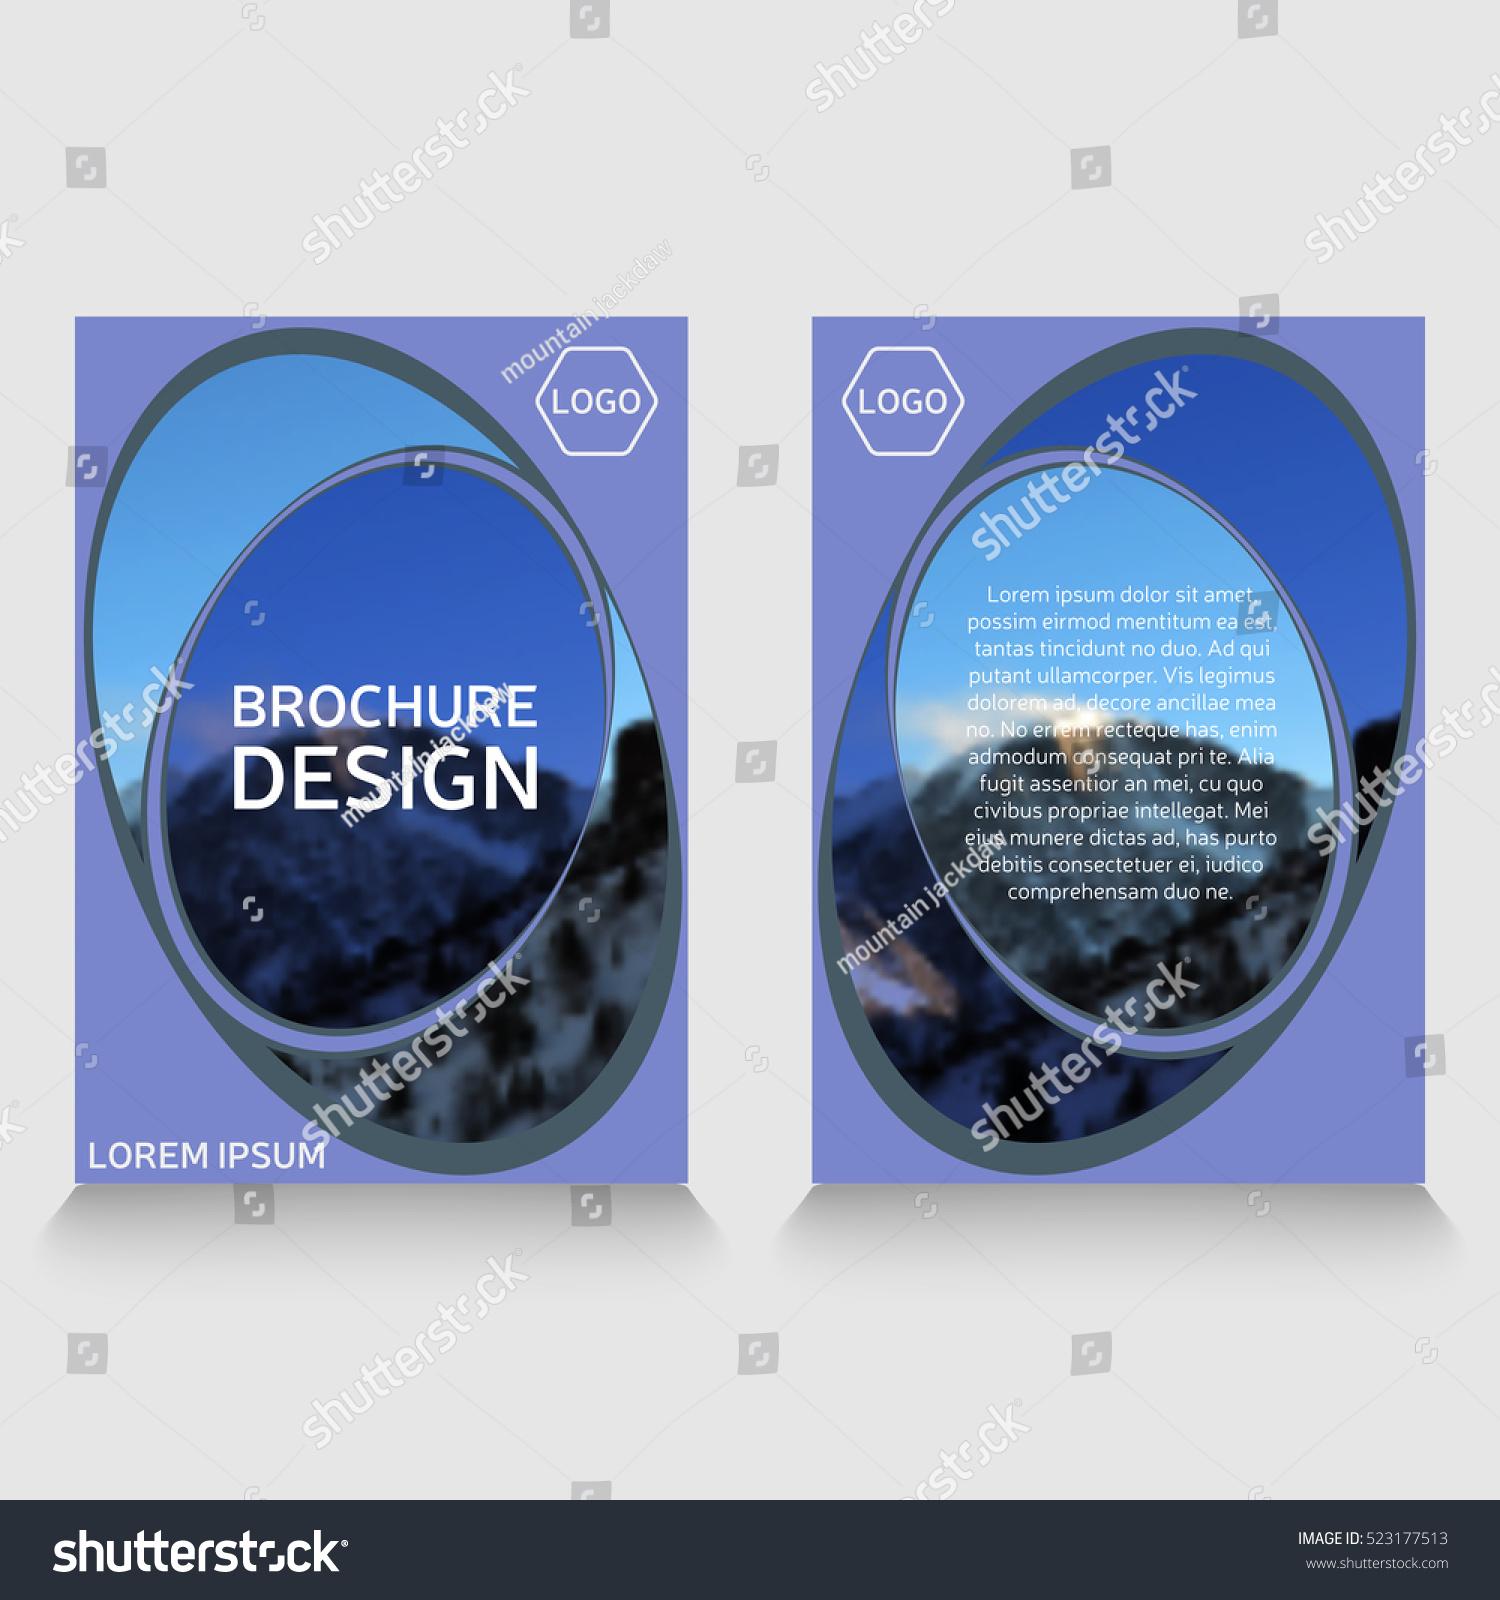 brochure template annual report sample leaflet のベクター画像素材